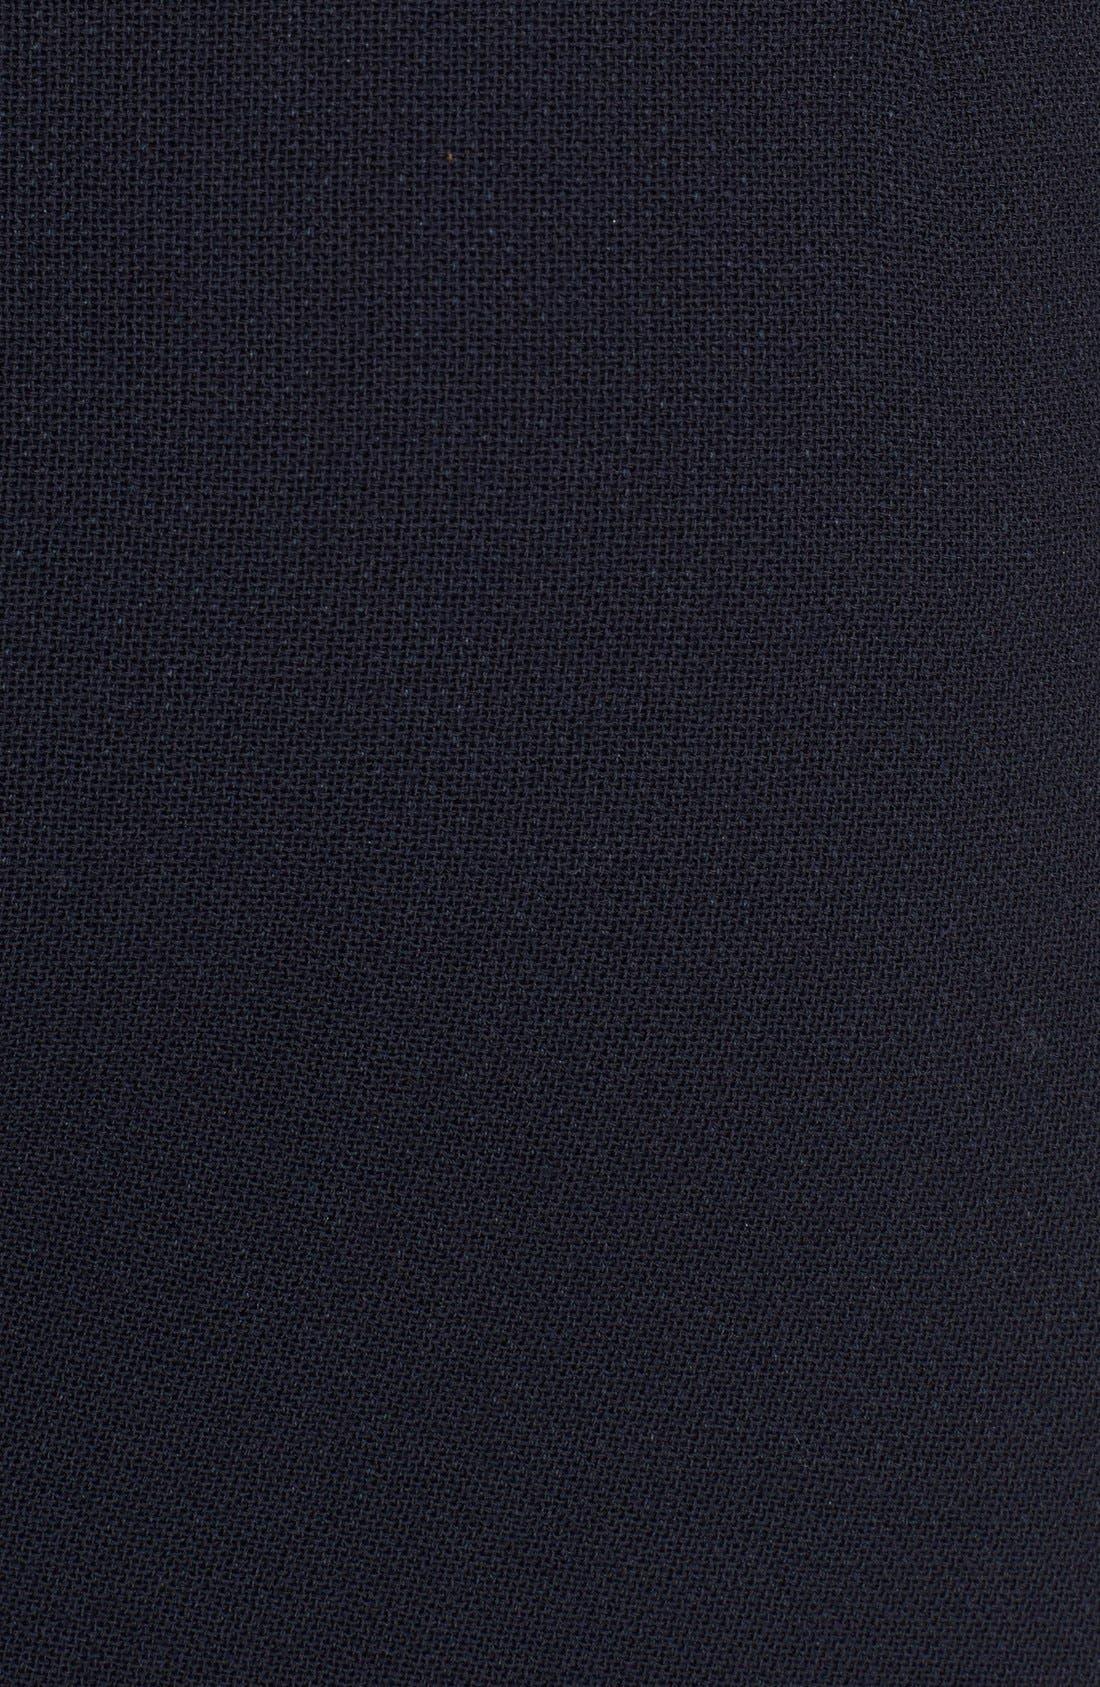 Alternate Image 4  - J.W.ANDERSON Stretch Crepe Midi Skirt